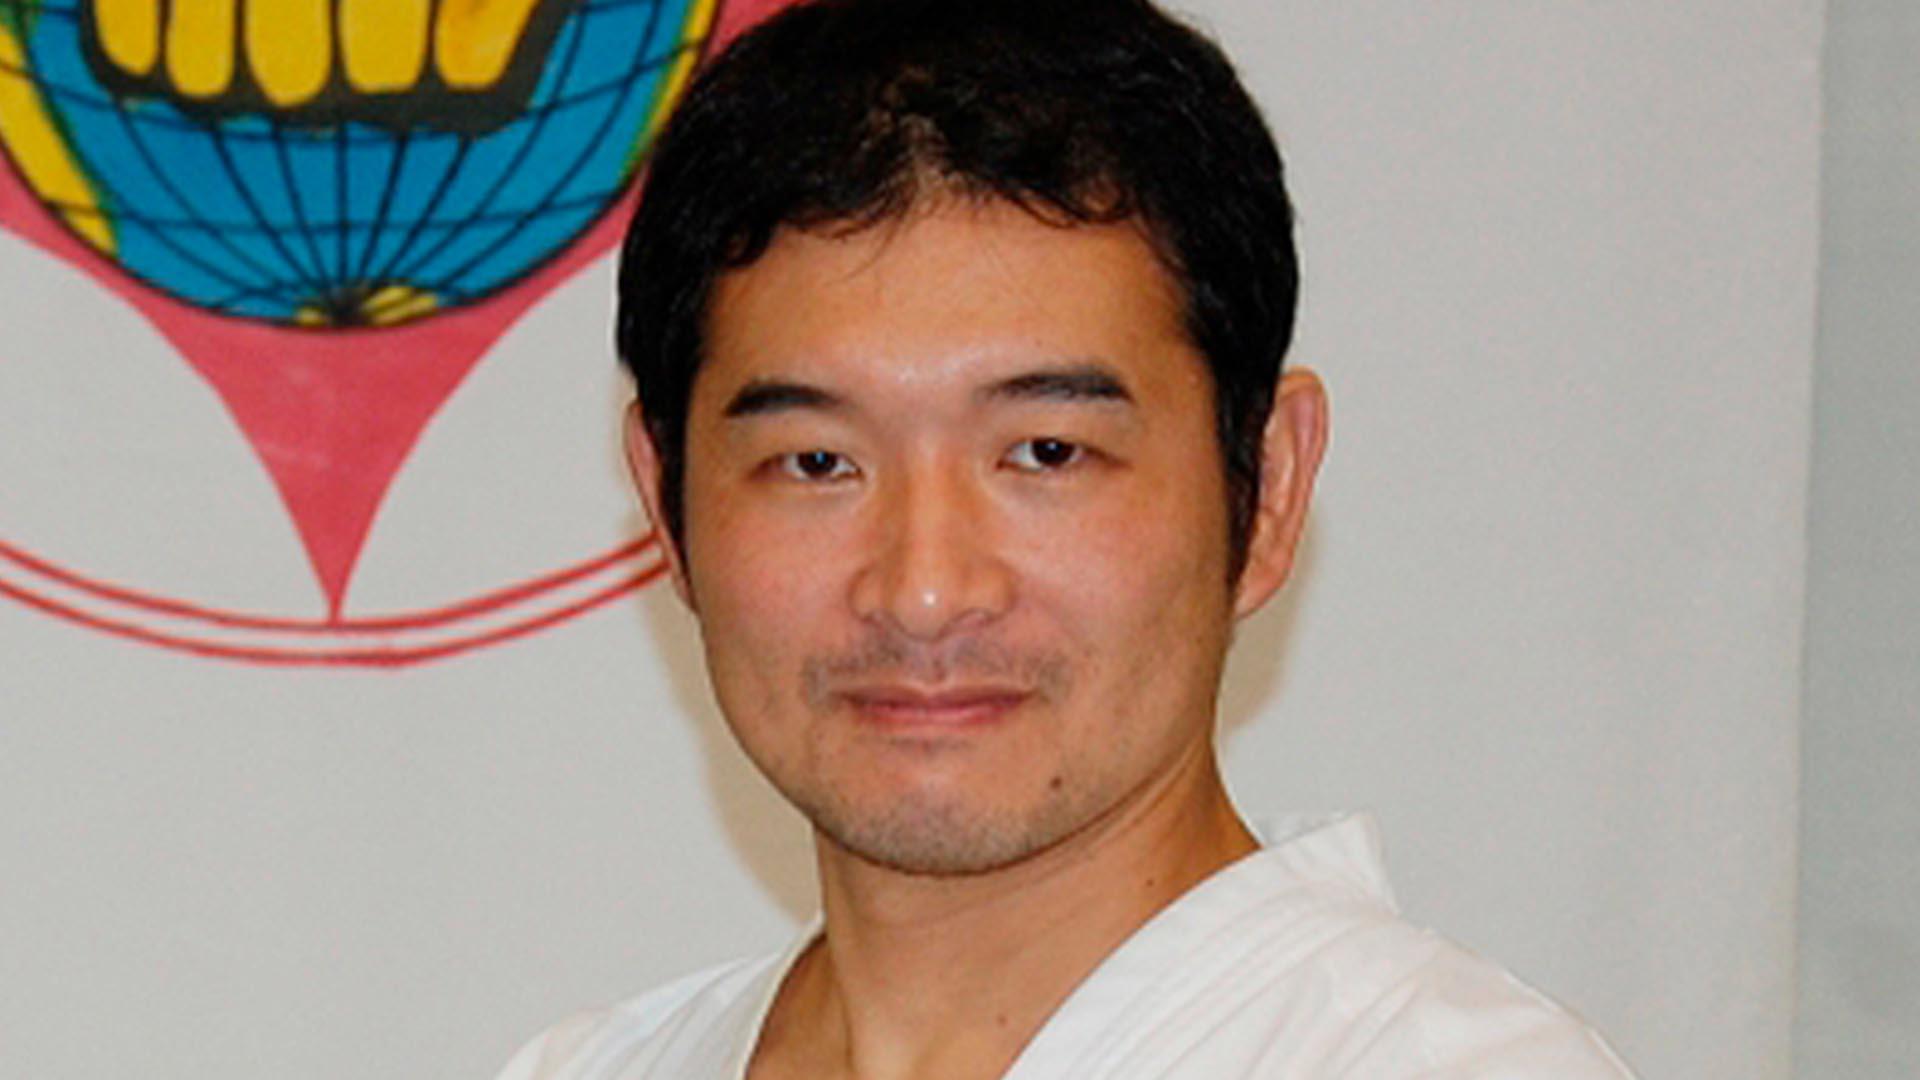 melhores karatecas do mundo Hitoshi Kiyama